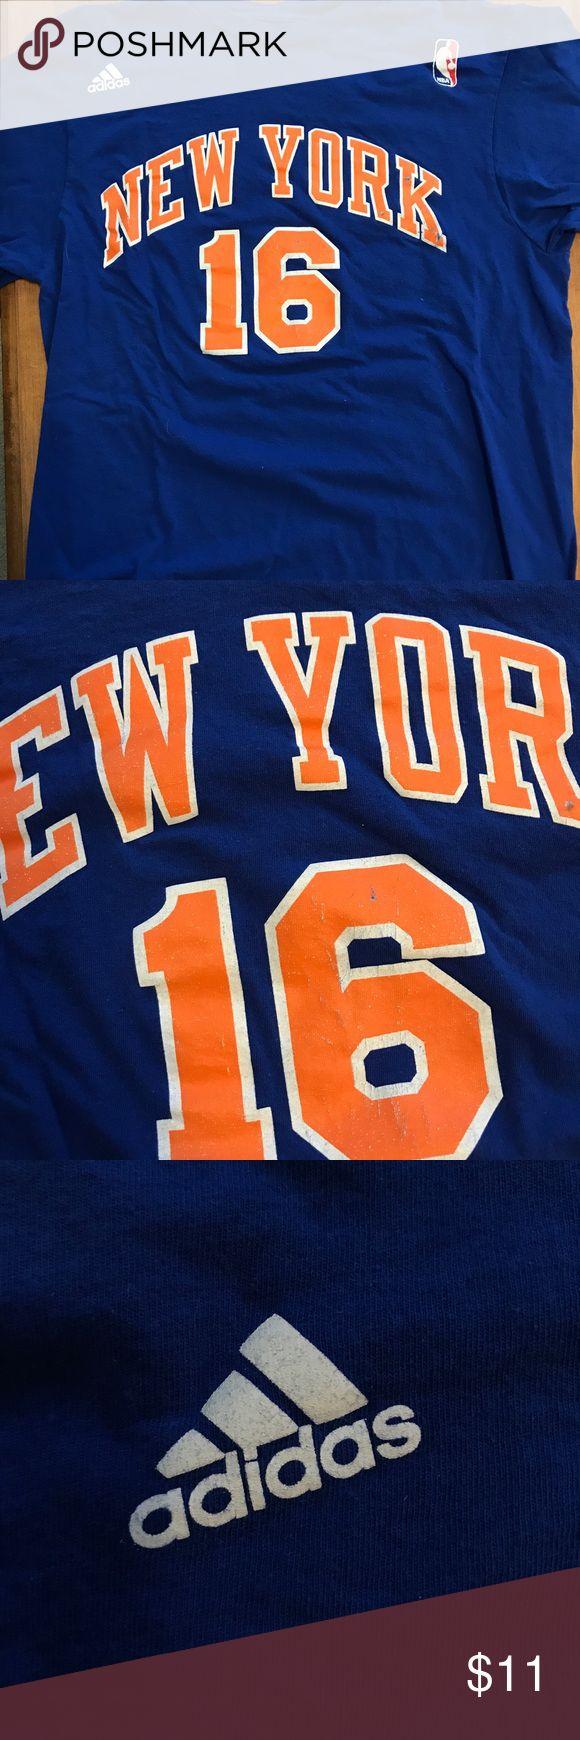 Steve Novak New York Knicks vintage t-shirt jersey Adidas Steve Novak vintage New York Knicks jersey, slight cracking in the letters with New York Knicks Symbol on the back. adidas Shirts Tees - Short Sleeve